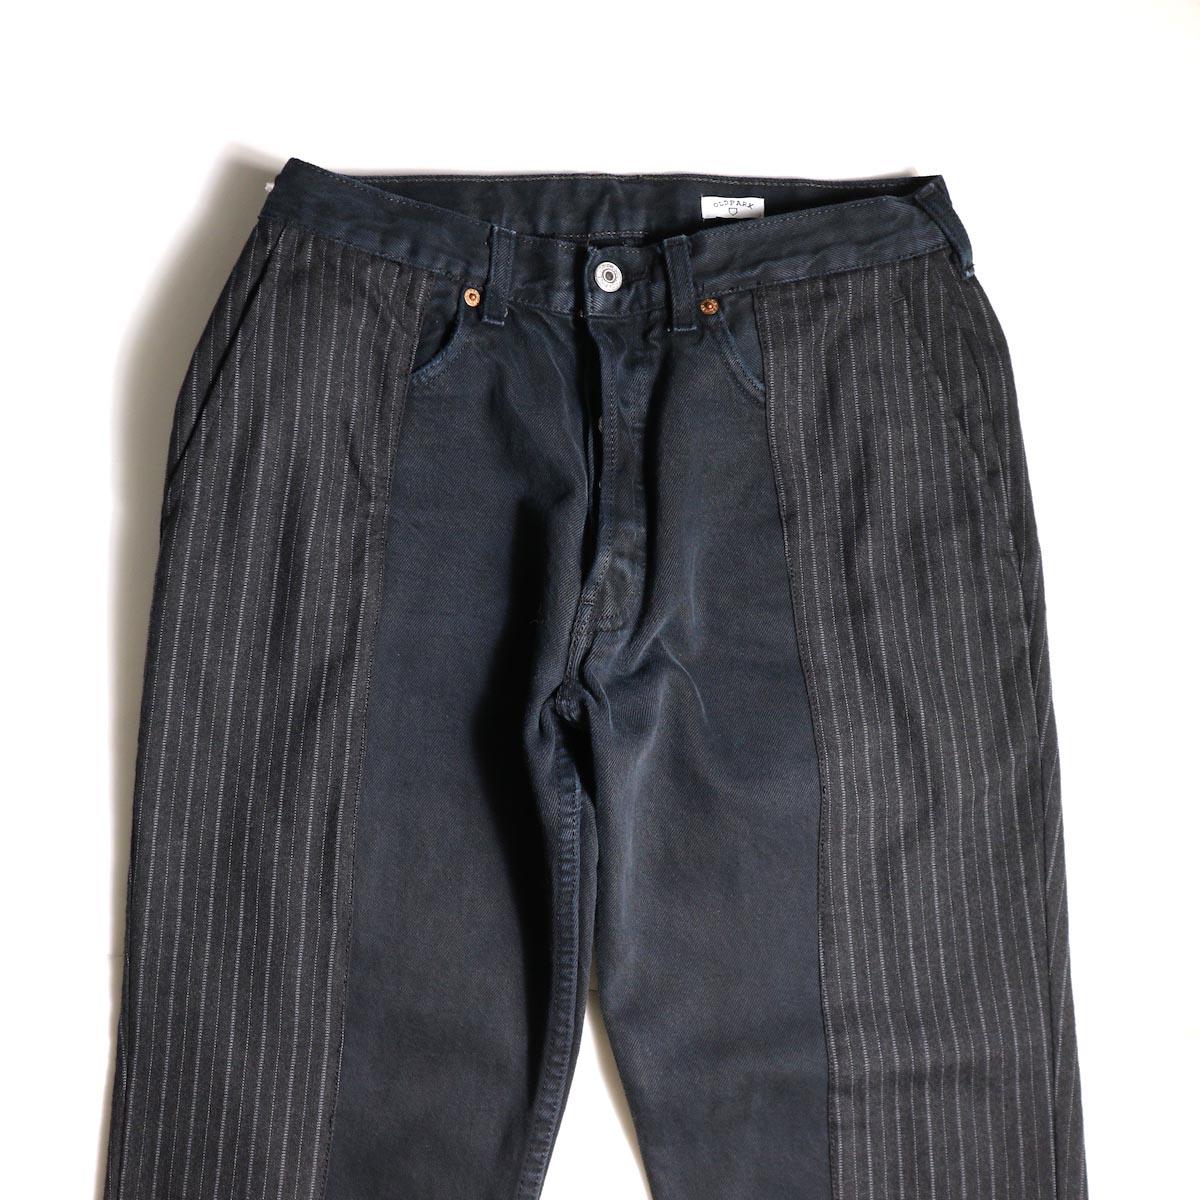 OLD PARK / Docking Jeans Black (Ssize-A)ウエスト